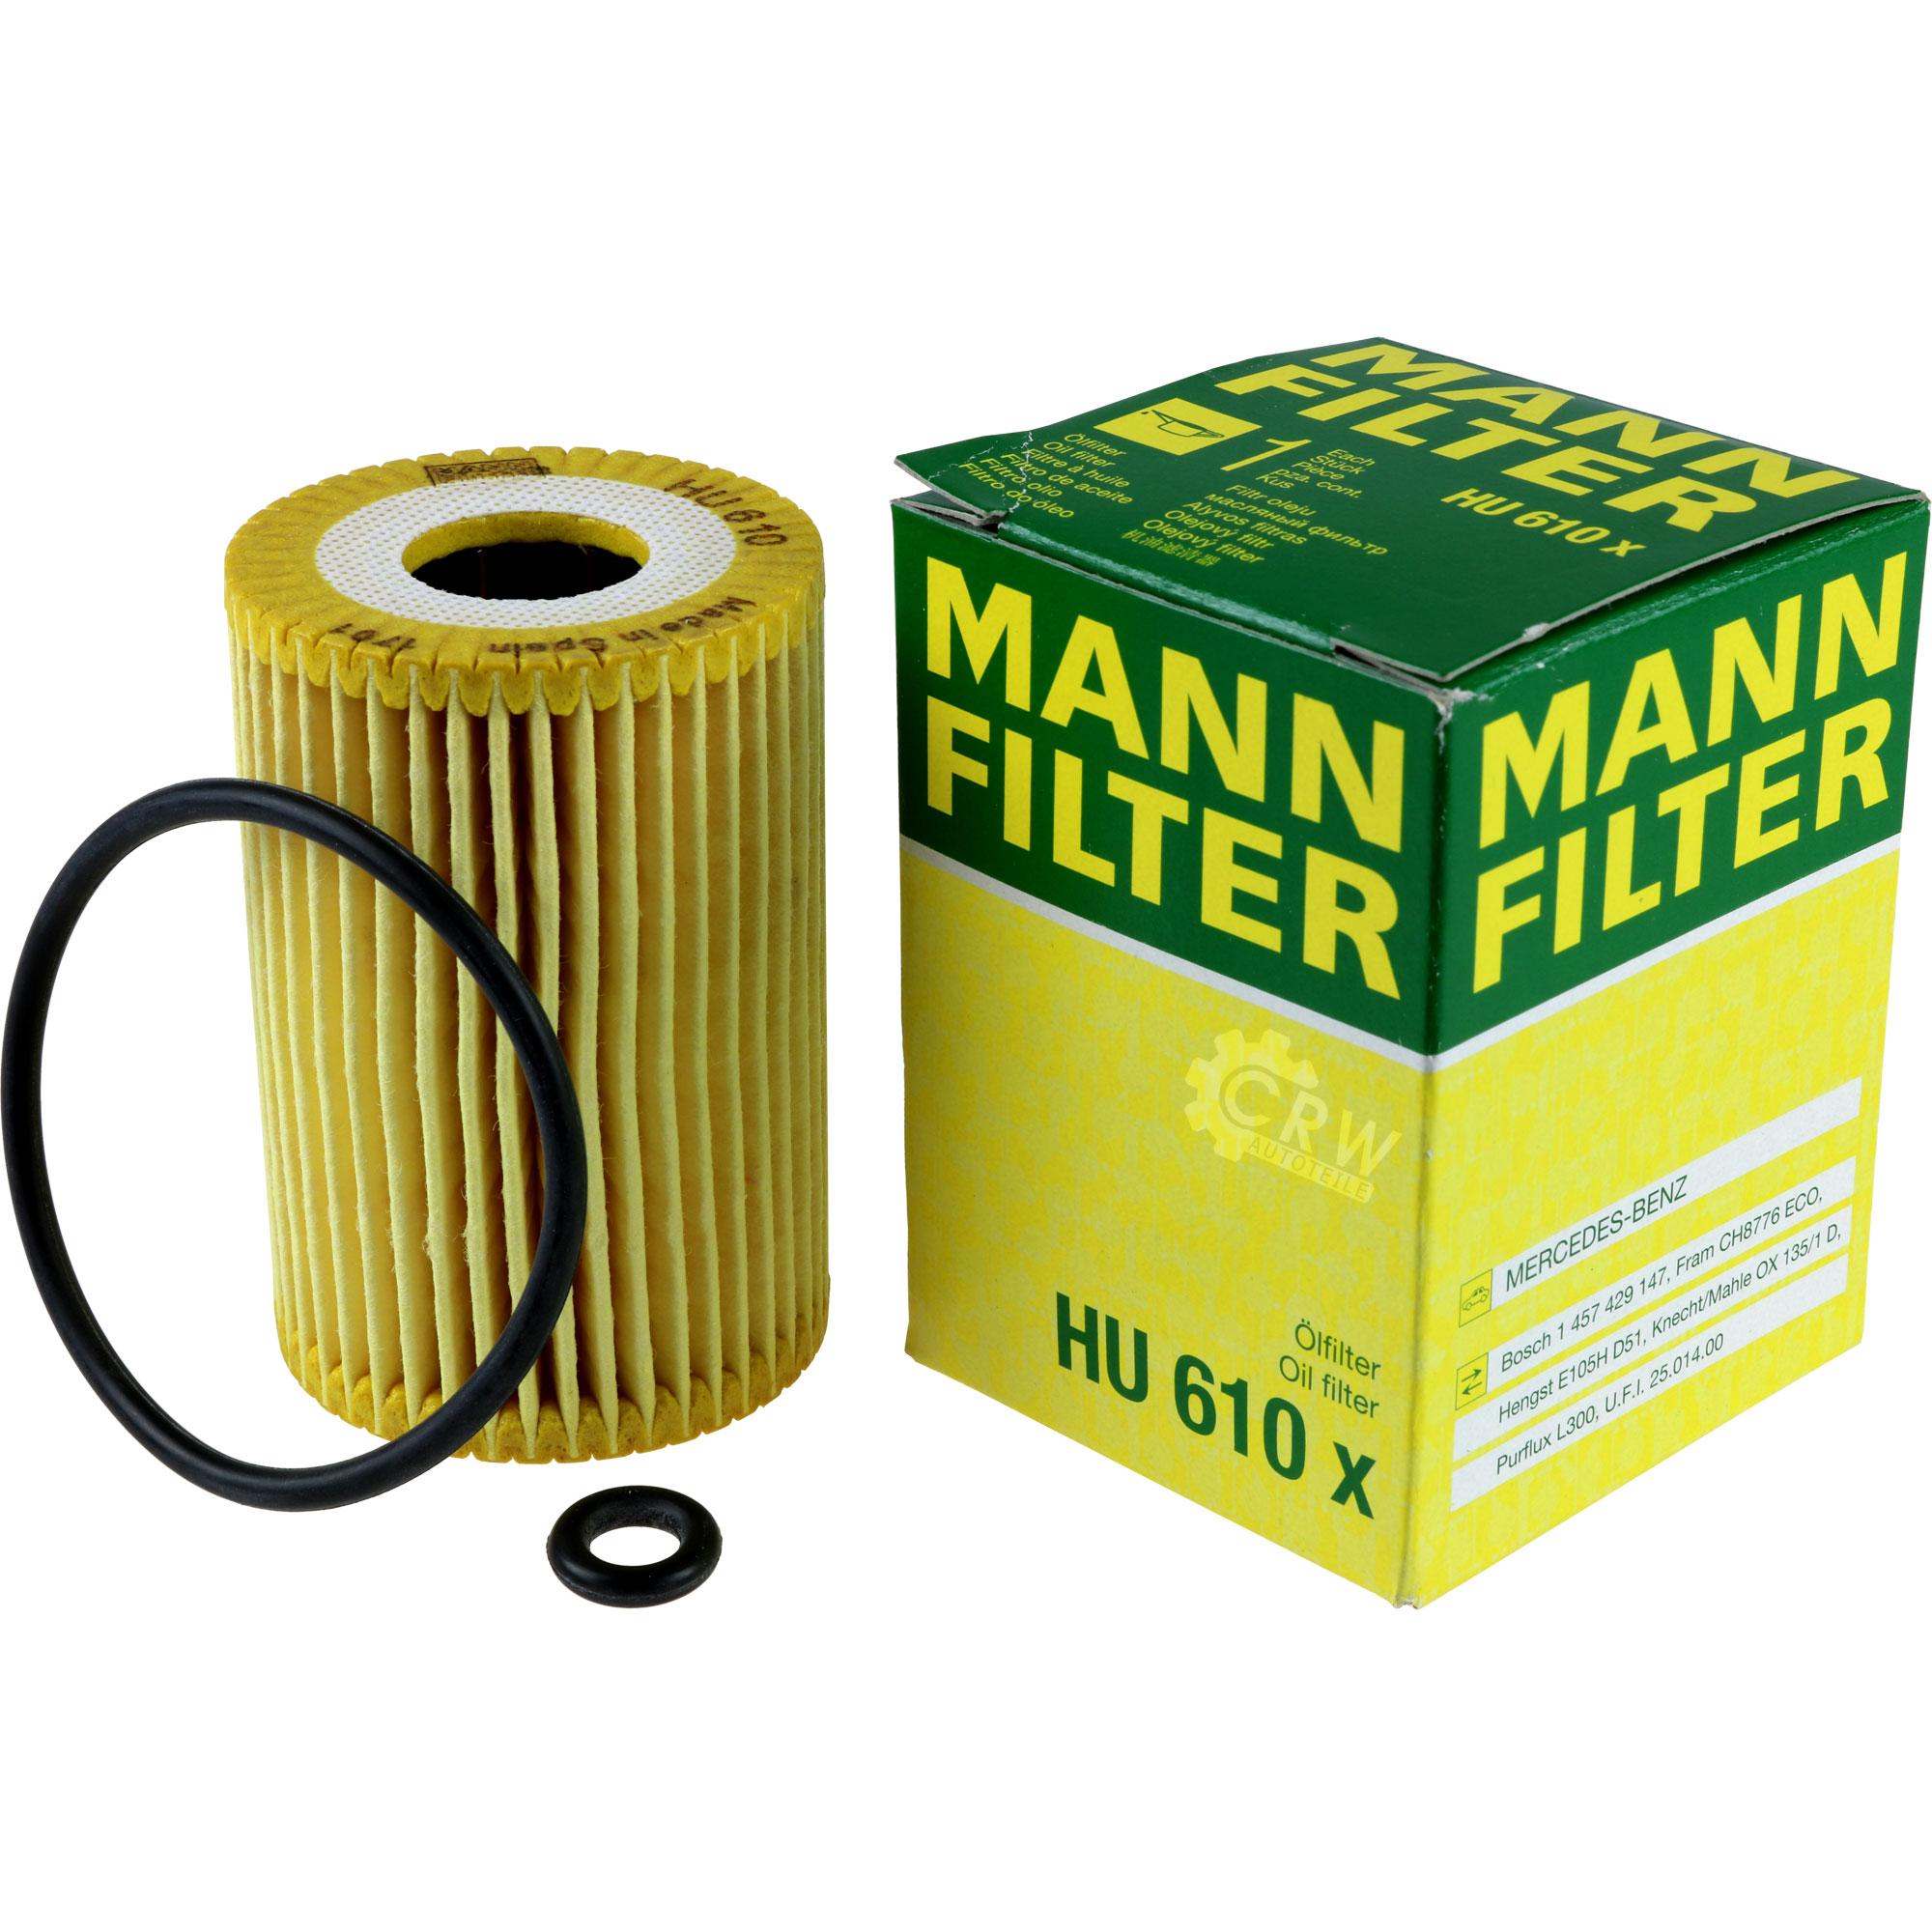 5L-Inspektionspaket-Mercedes-229-1-Motoroel-10W-40-MANN-Olfilter-11114062 Indexbild 3